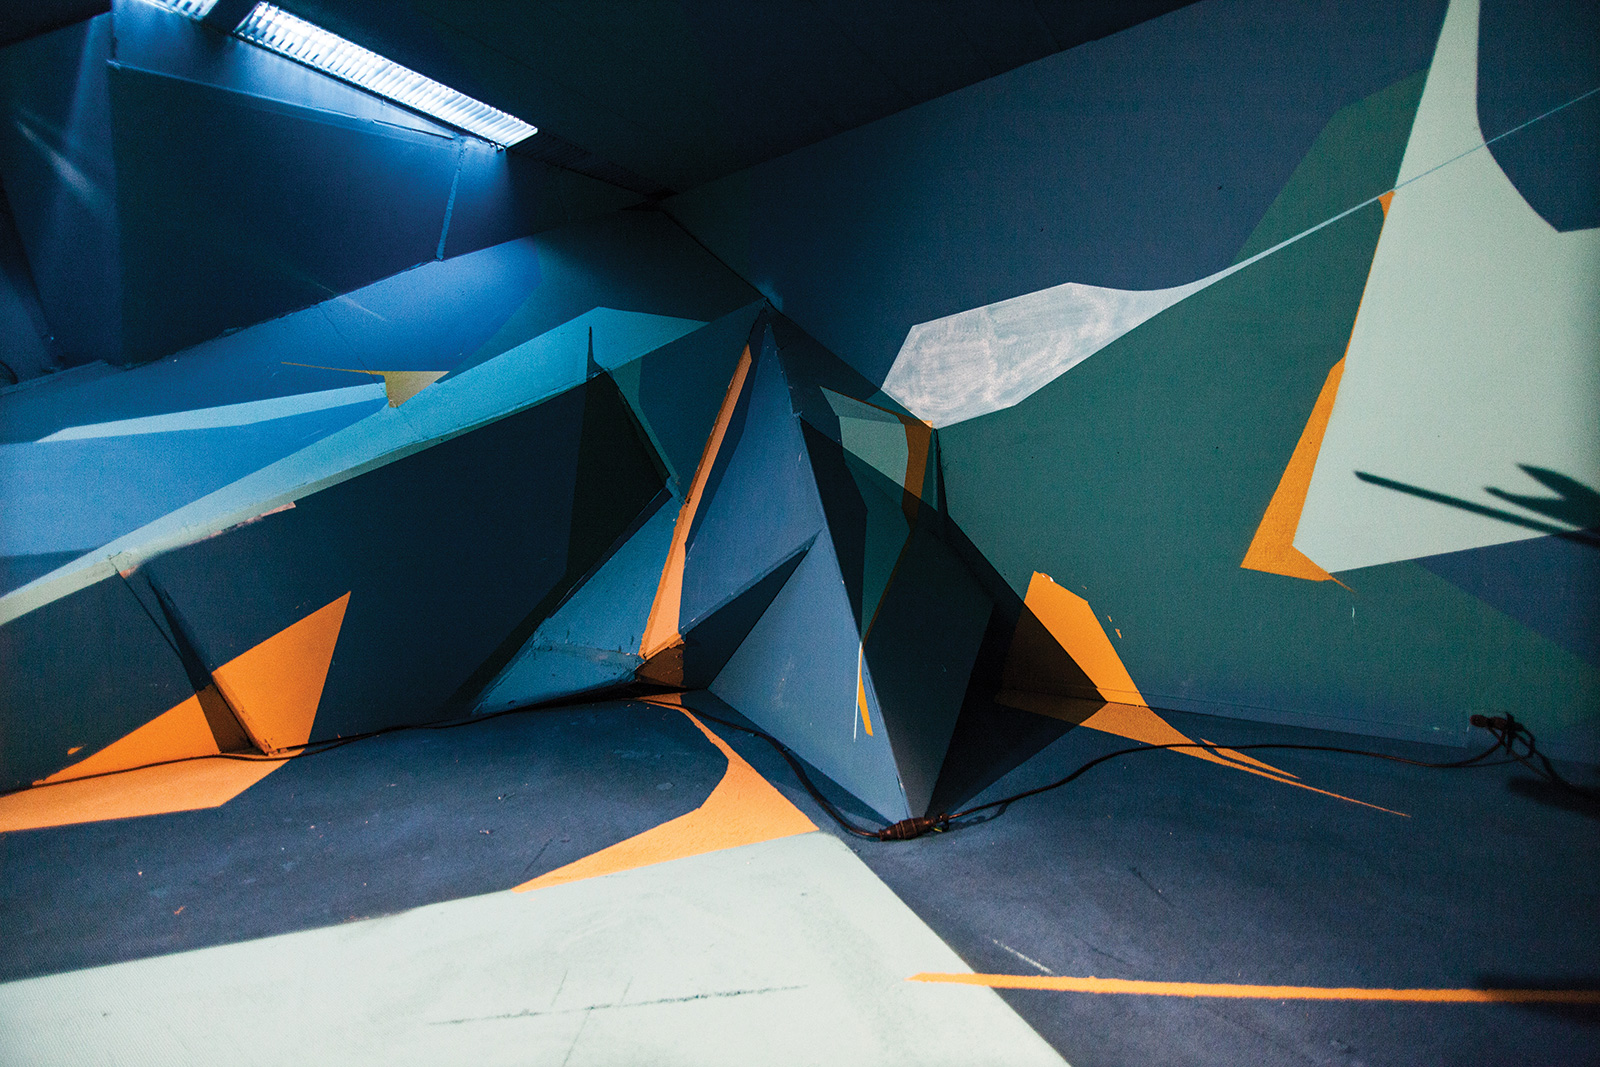 Berlin Art Bank – The Haus